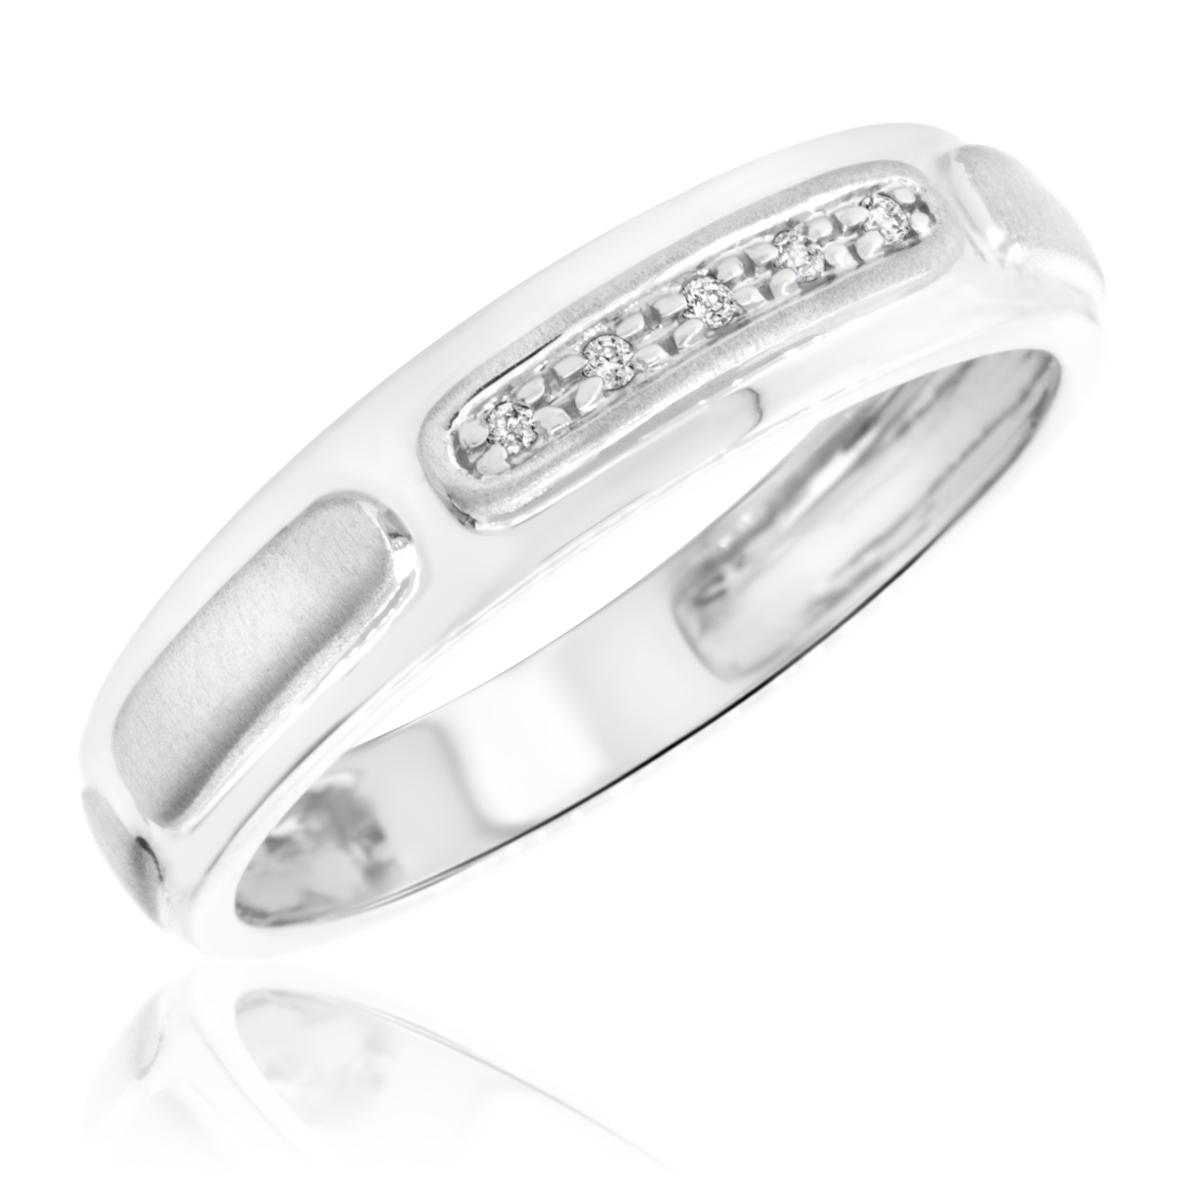 1/20 Carat T.W. Round Cut Diamond Mens Wedding Band 10K White Gold- Size 8